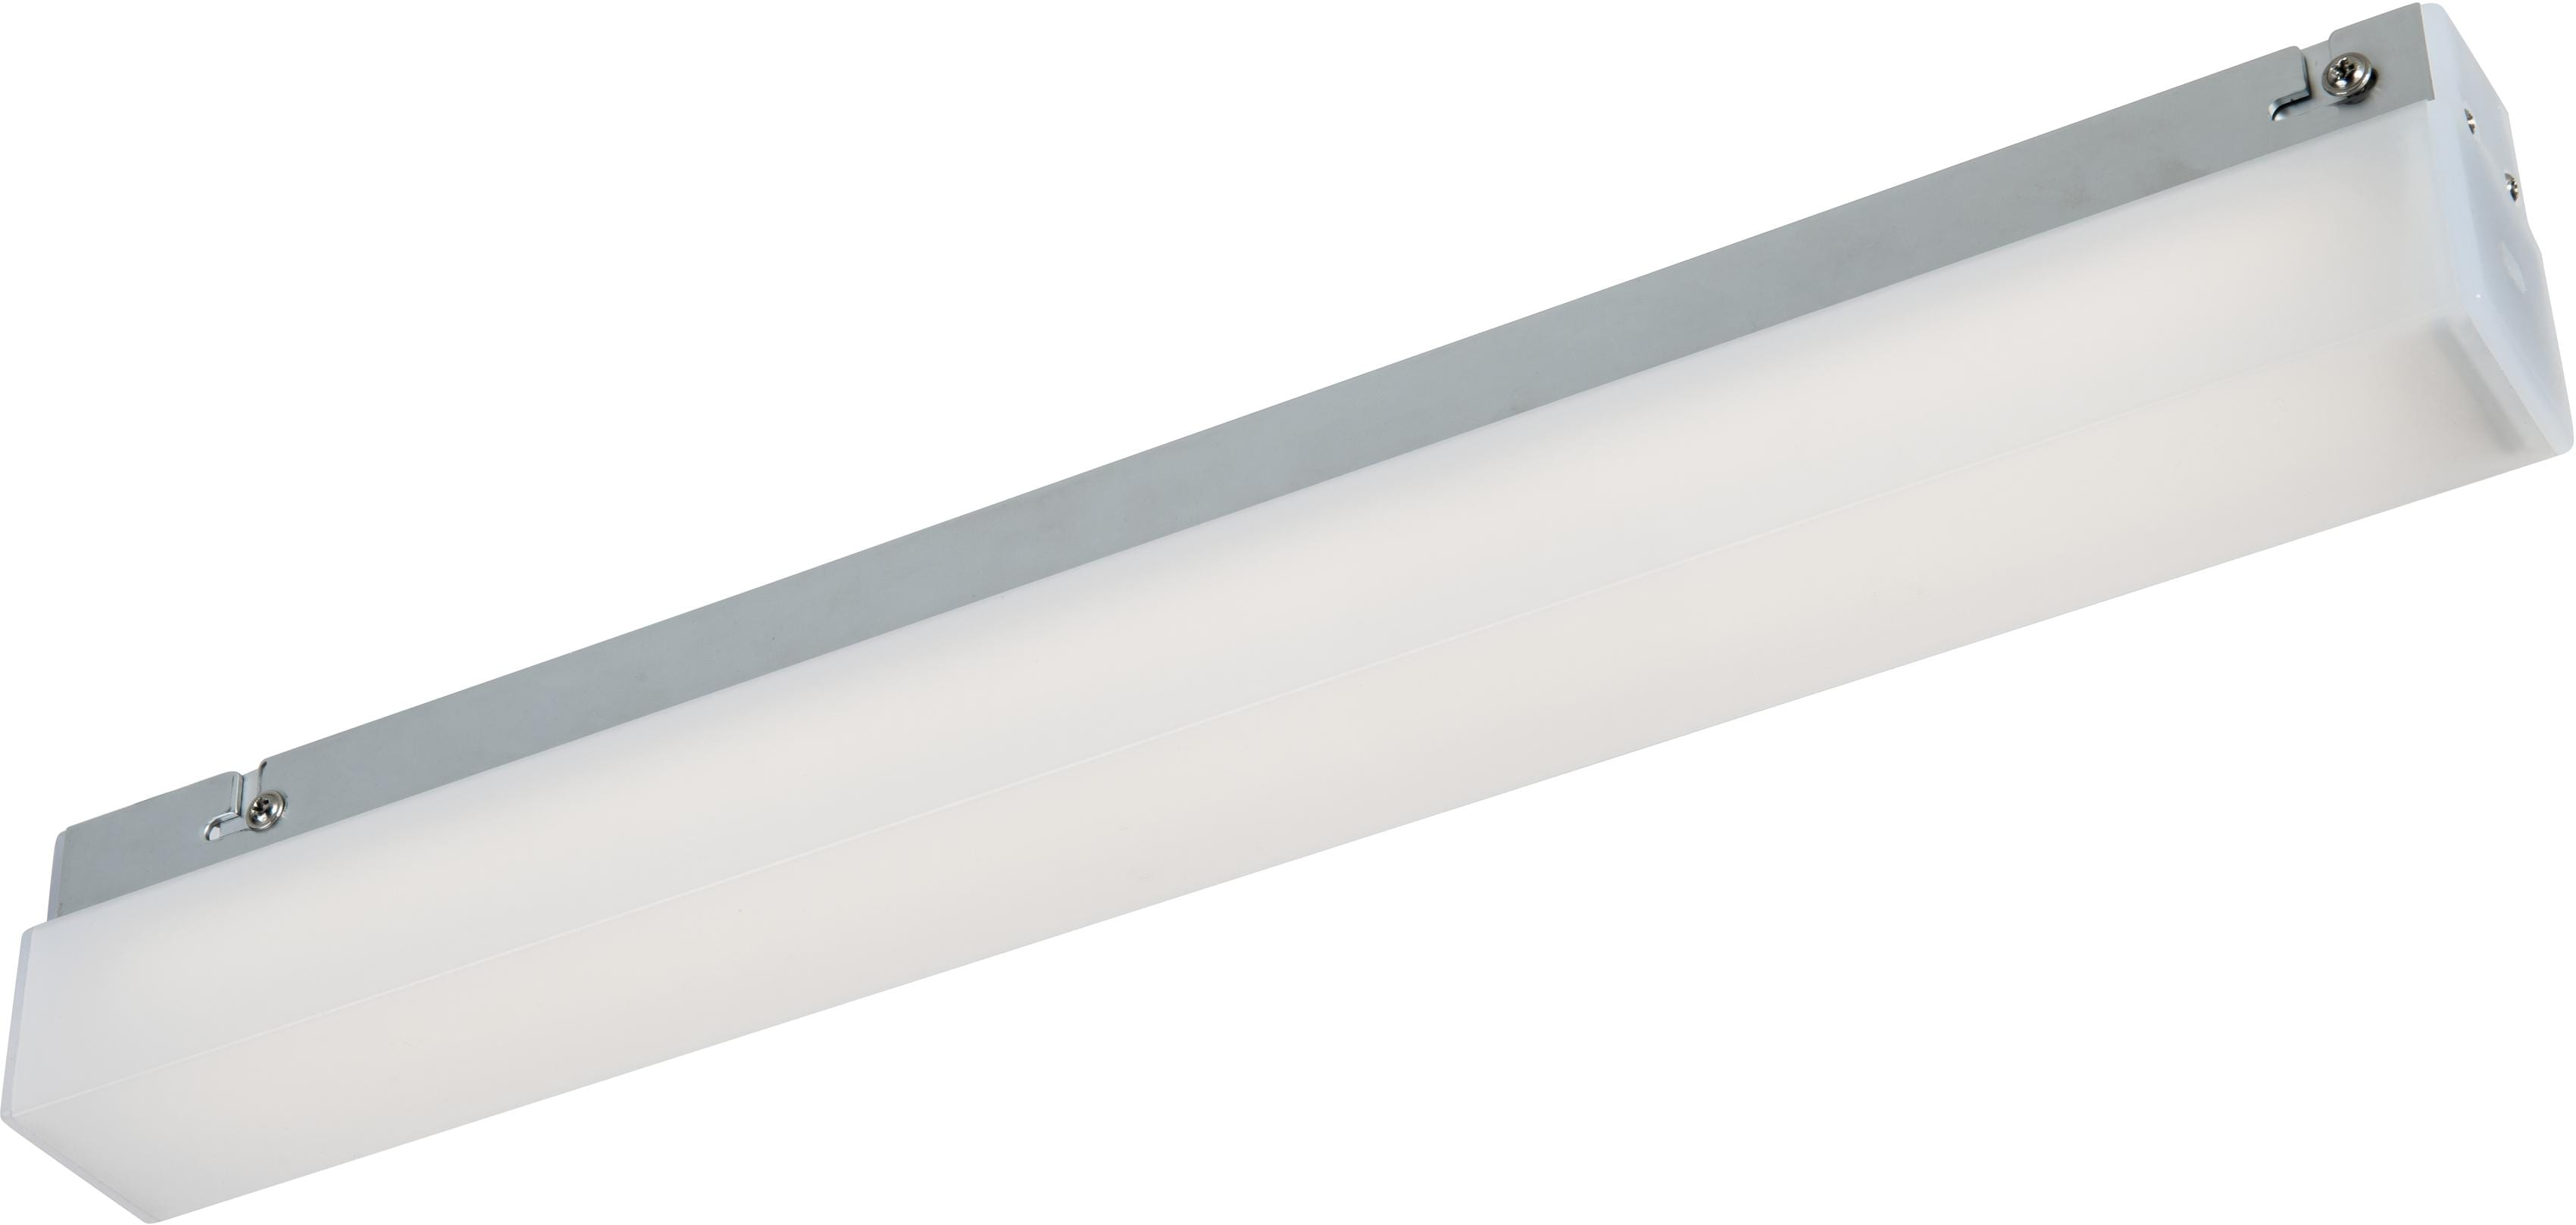 Nino Leuchten,LED Wandleuchte SPARKY